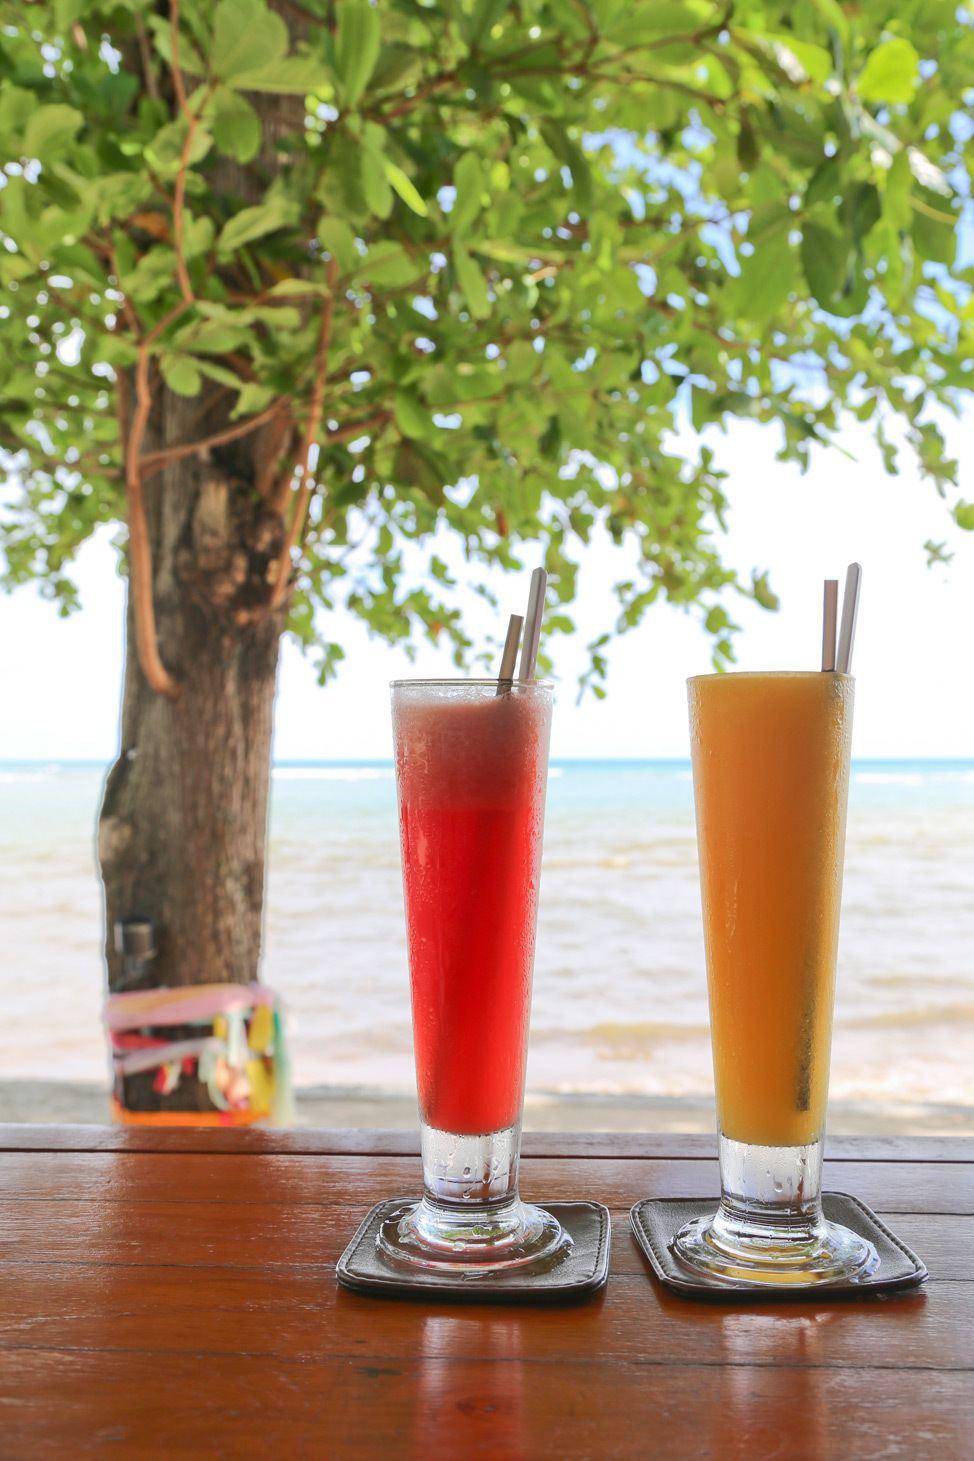 4K Restaurant and Bar at the X2 Koh Samui Resort